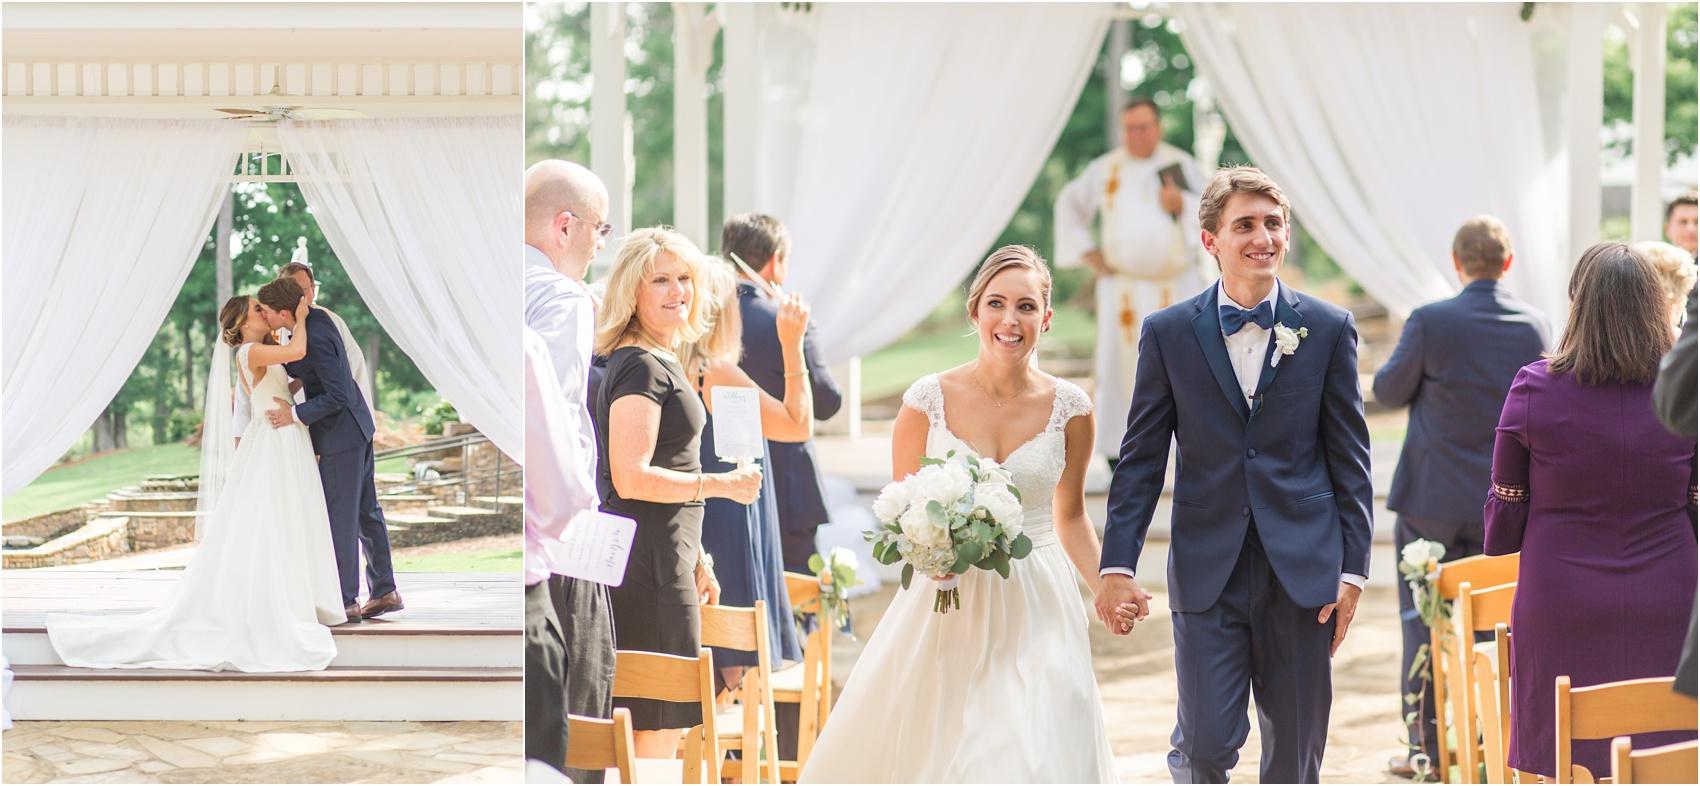 Savannah Eve Photography- Sigl-Adams Wedding- Sneak Peek-41.jpg